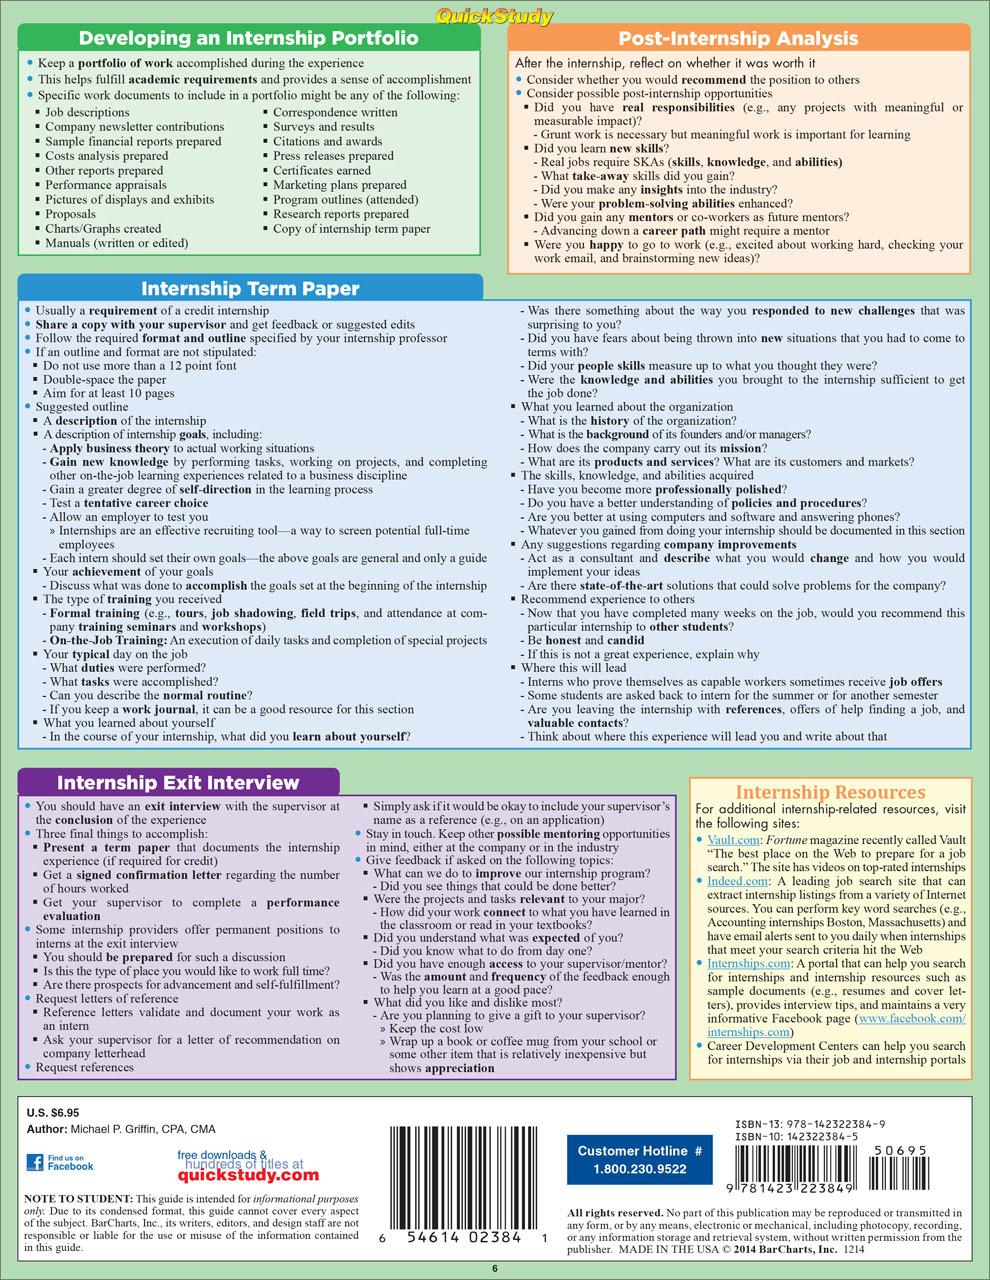 Quick Study QuickStudy Job Hunt: Internships Laminated Reference Guide BarCharts Publishing Career Outline Back Image